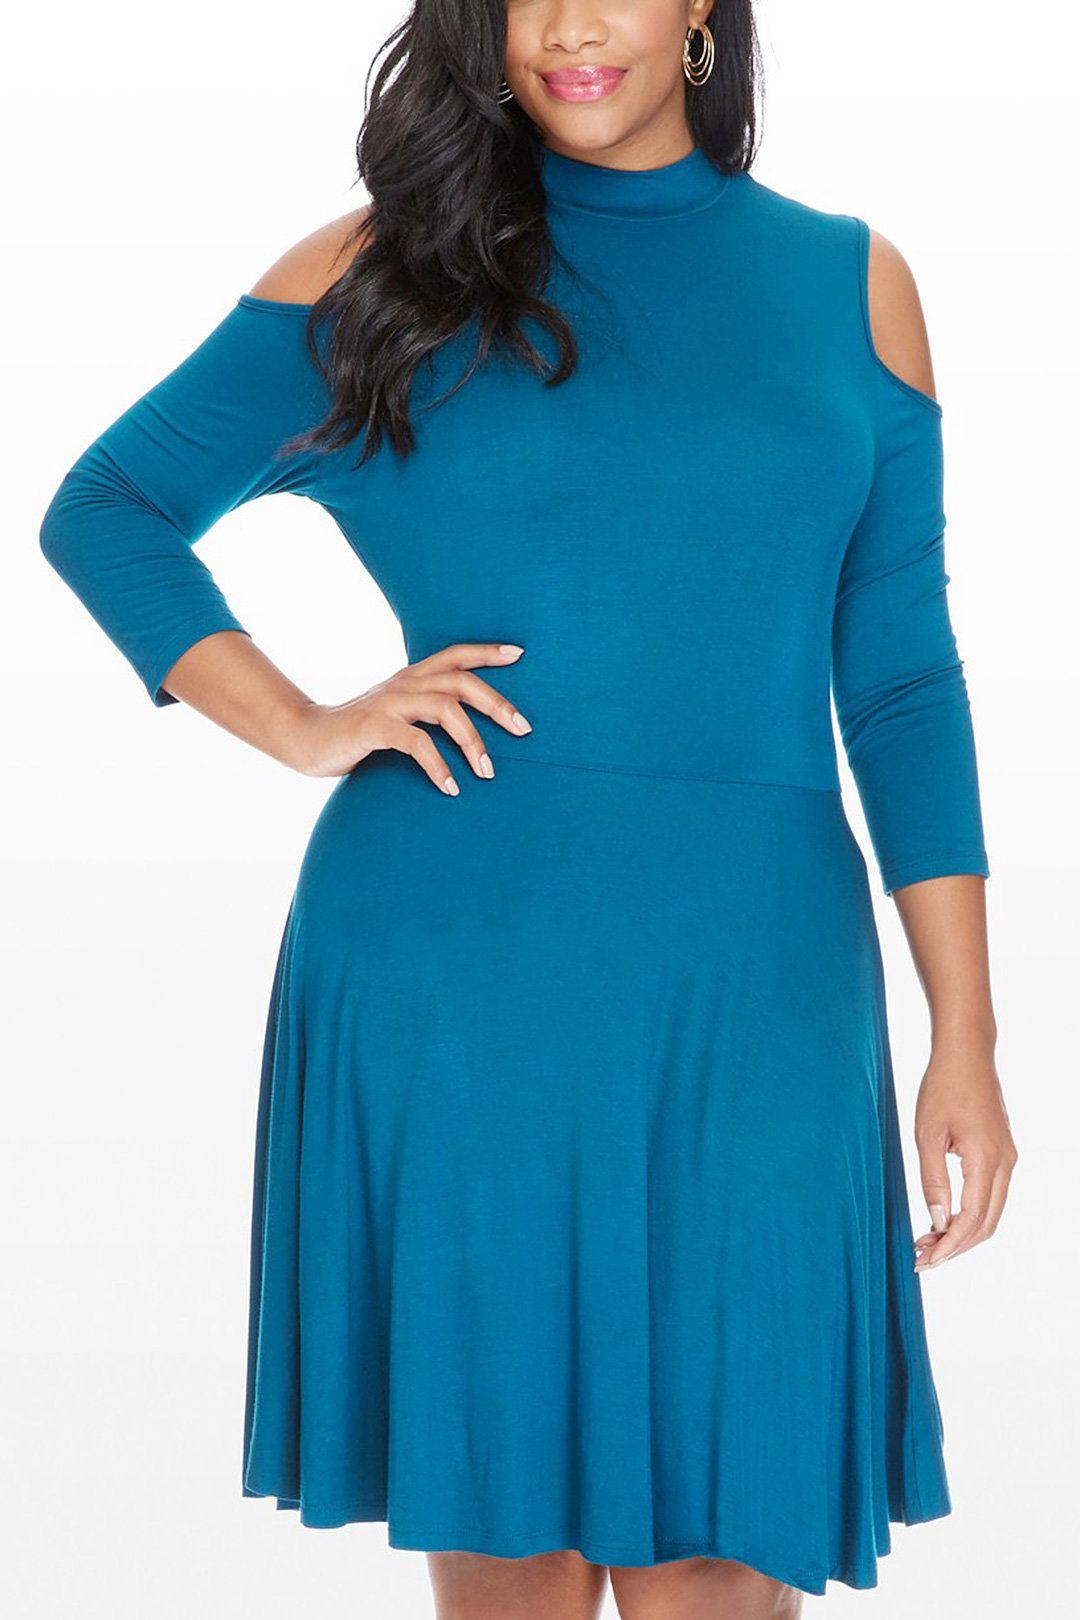 Plus Size Cold Shoulder Dress in Medium Blue - US$21.95 -YOINS